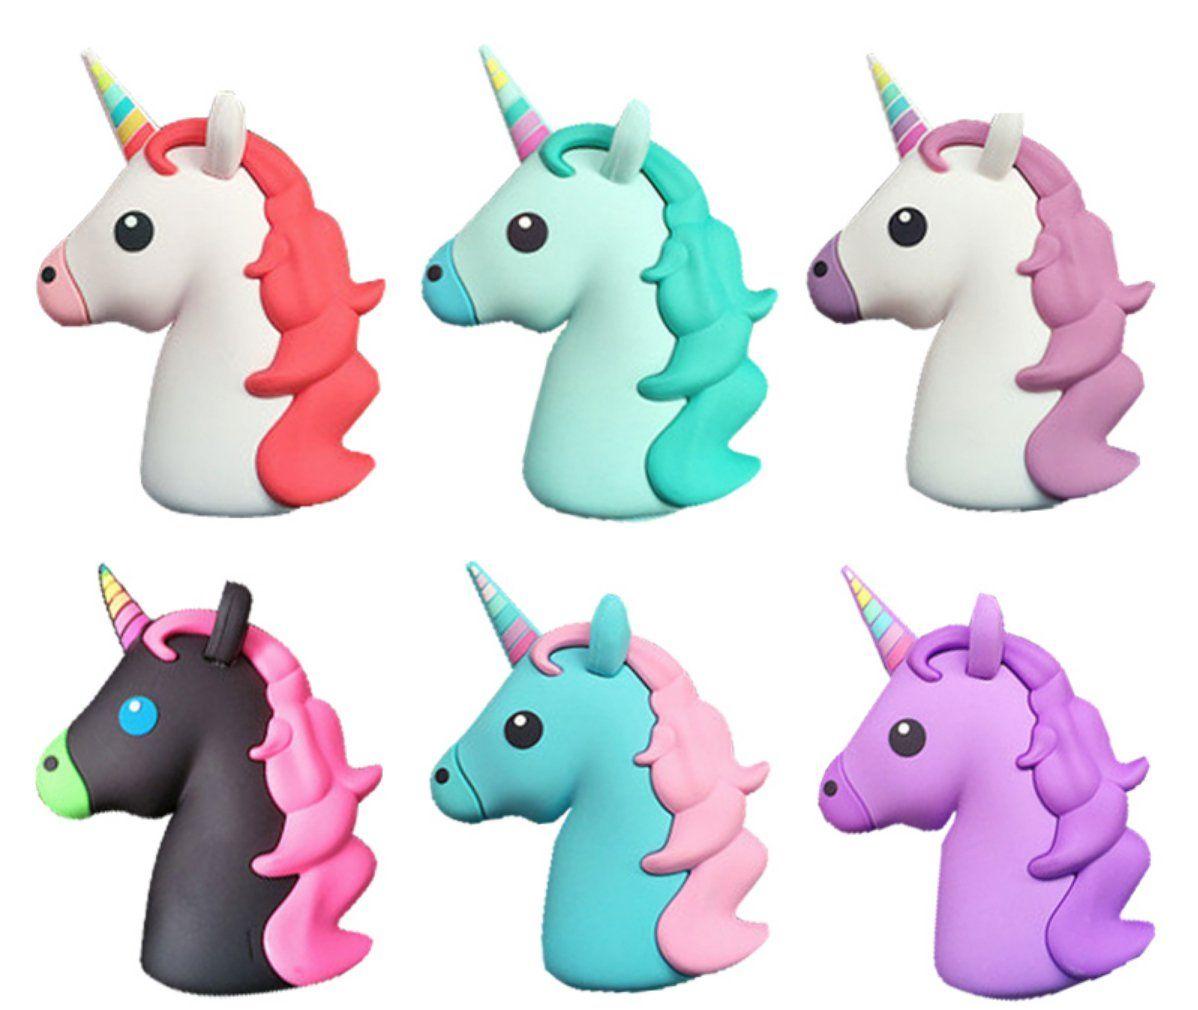 UNICORN POWER BANK PORTABLE PHONE CHARGER – Unicorns   Mermaids ... 22b2cf9ae